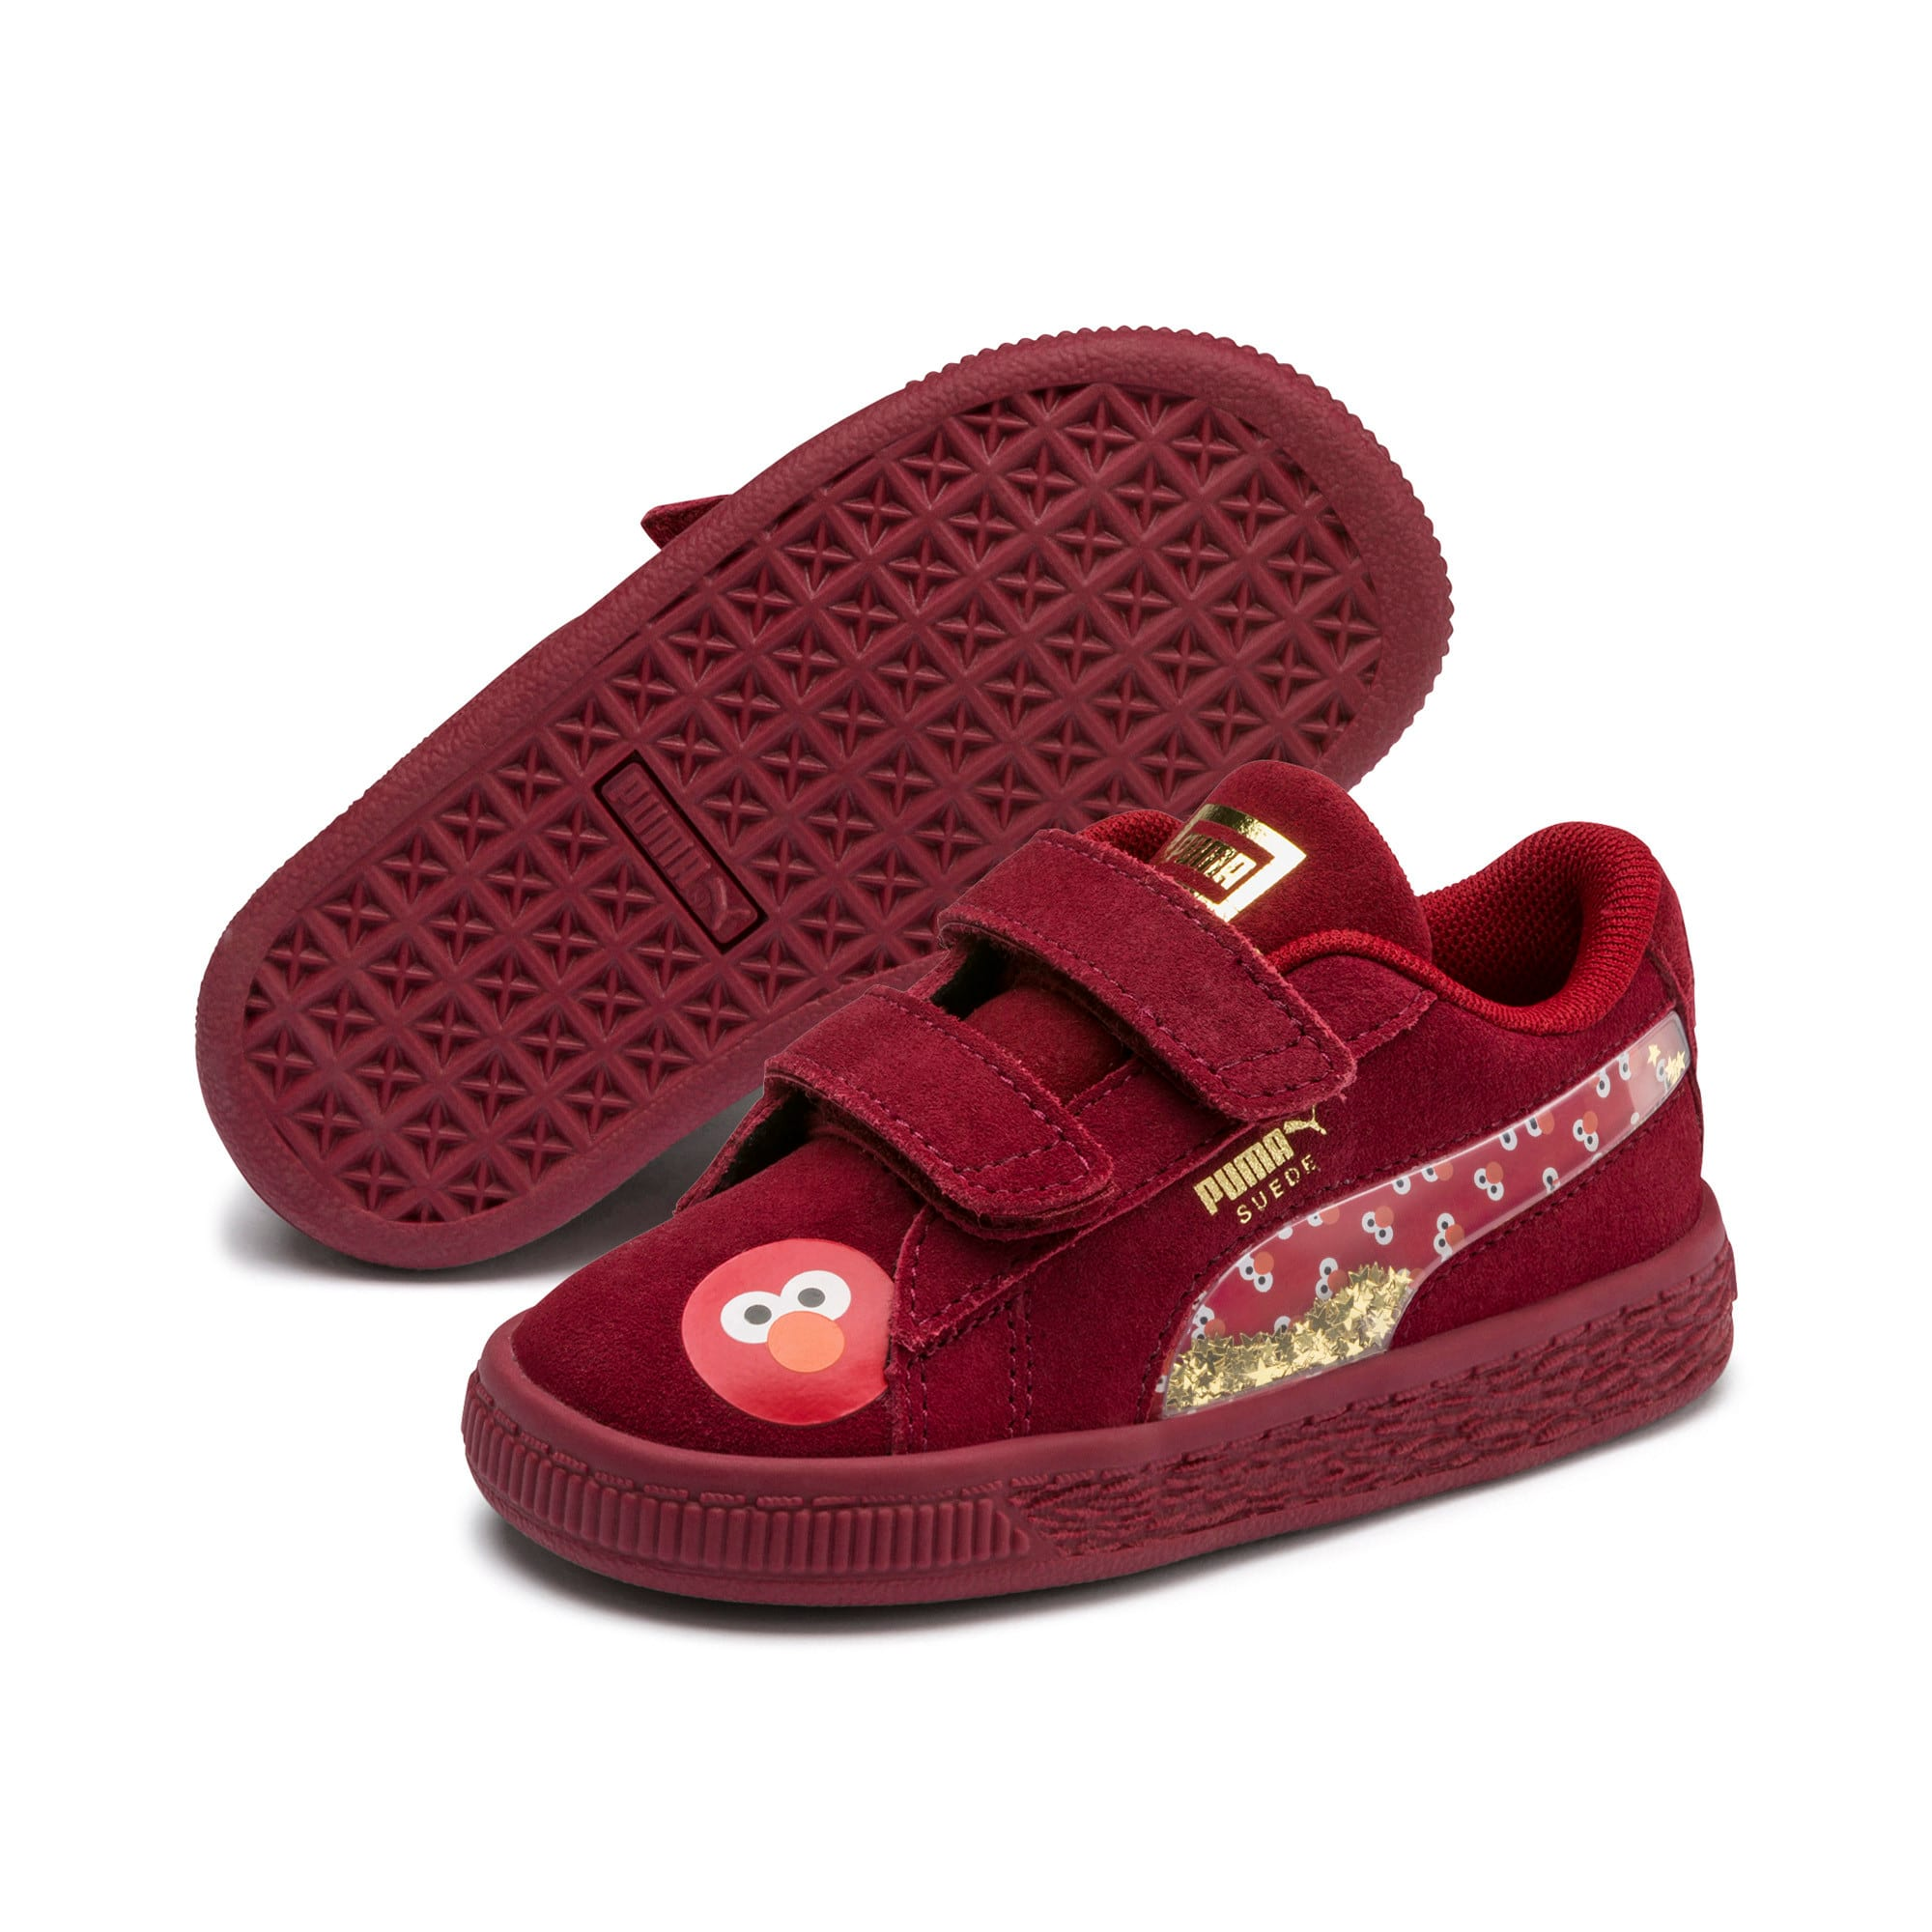 Thumbnail 2 of PUMA x SESAME STREET 50 Suede Statement Toddler Shoes, Rhubarb-Puma White, medium